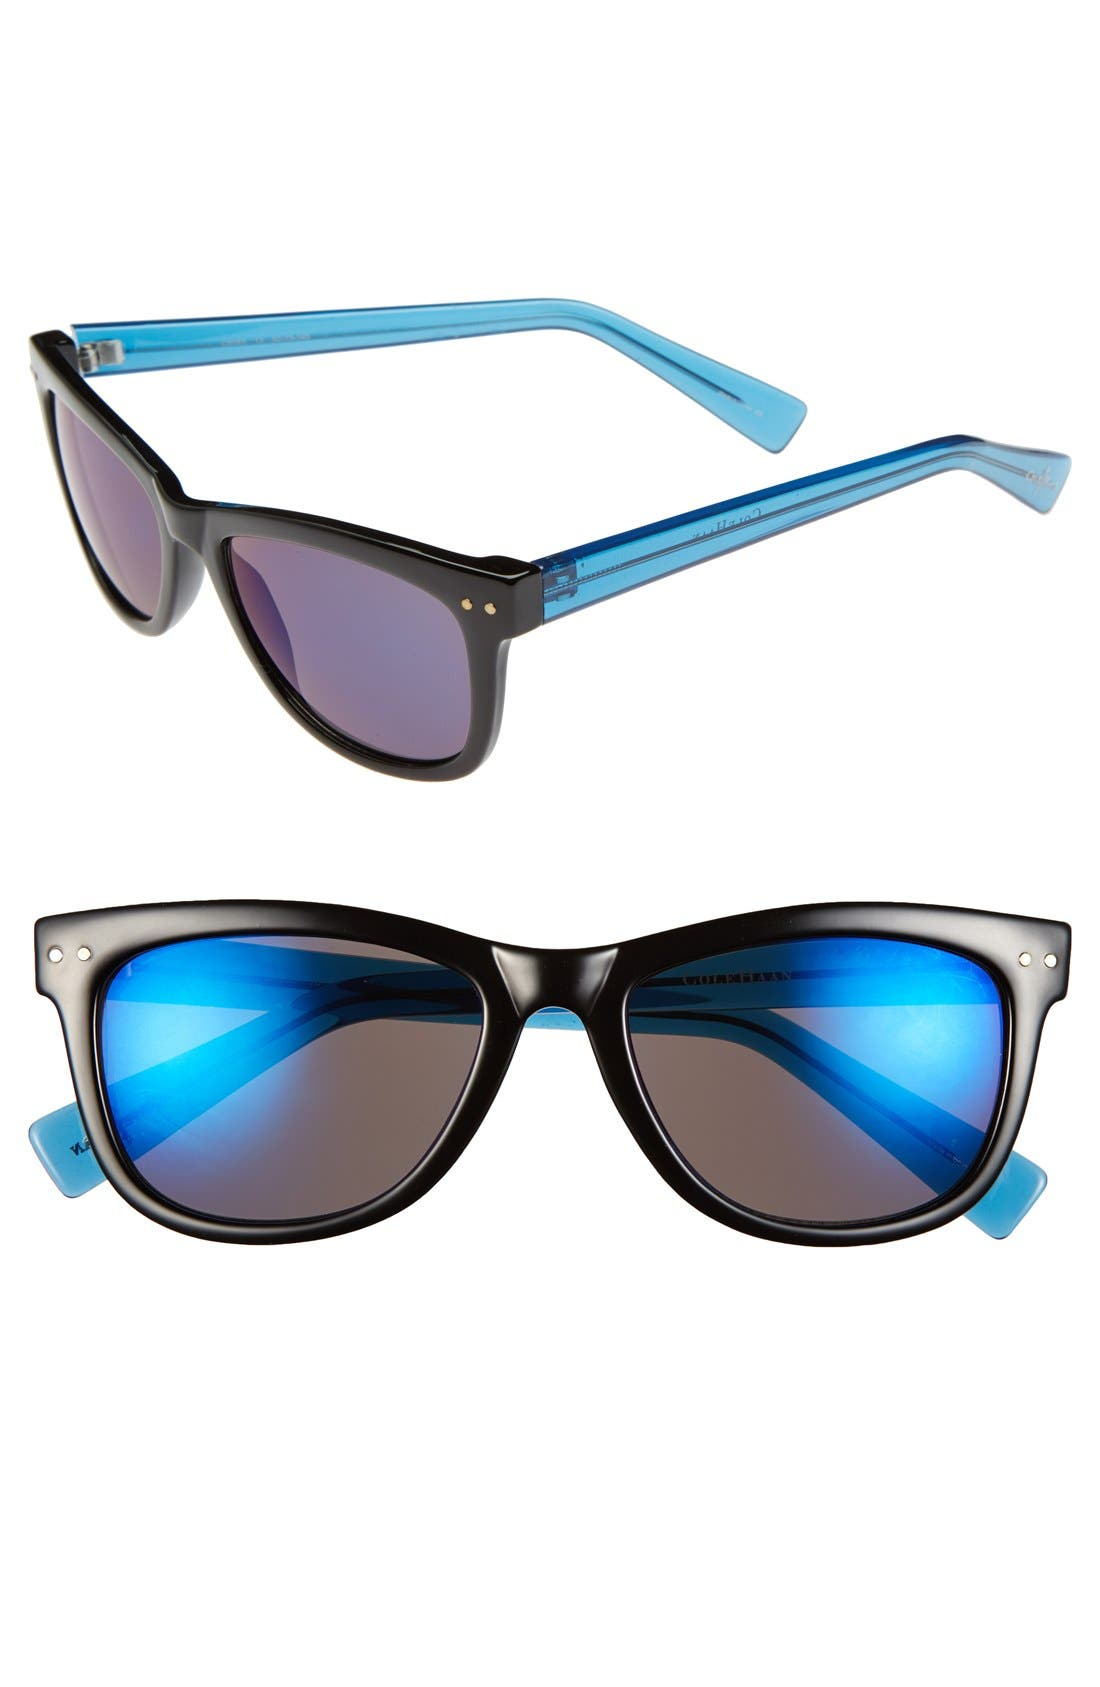 Main Image - Cole Haan 52mm Retro Sunglasses